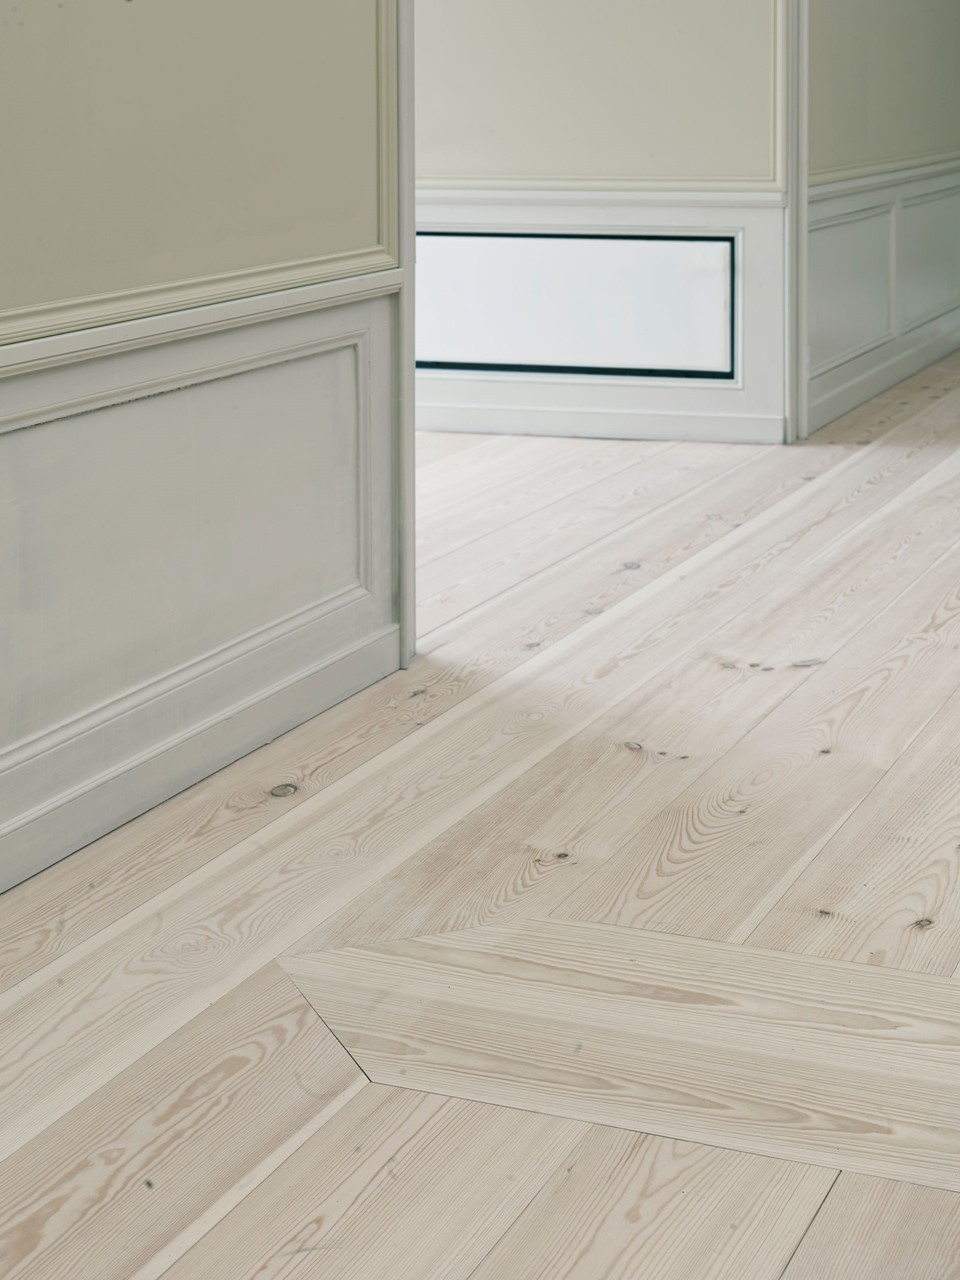 pine-plank-floor-restoration_natural-soap_amalienborg_dinesen.jpg